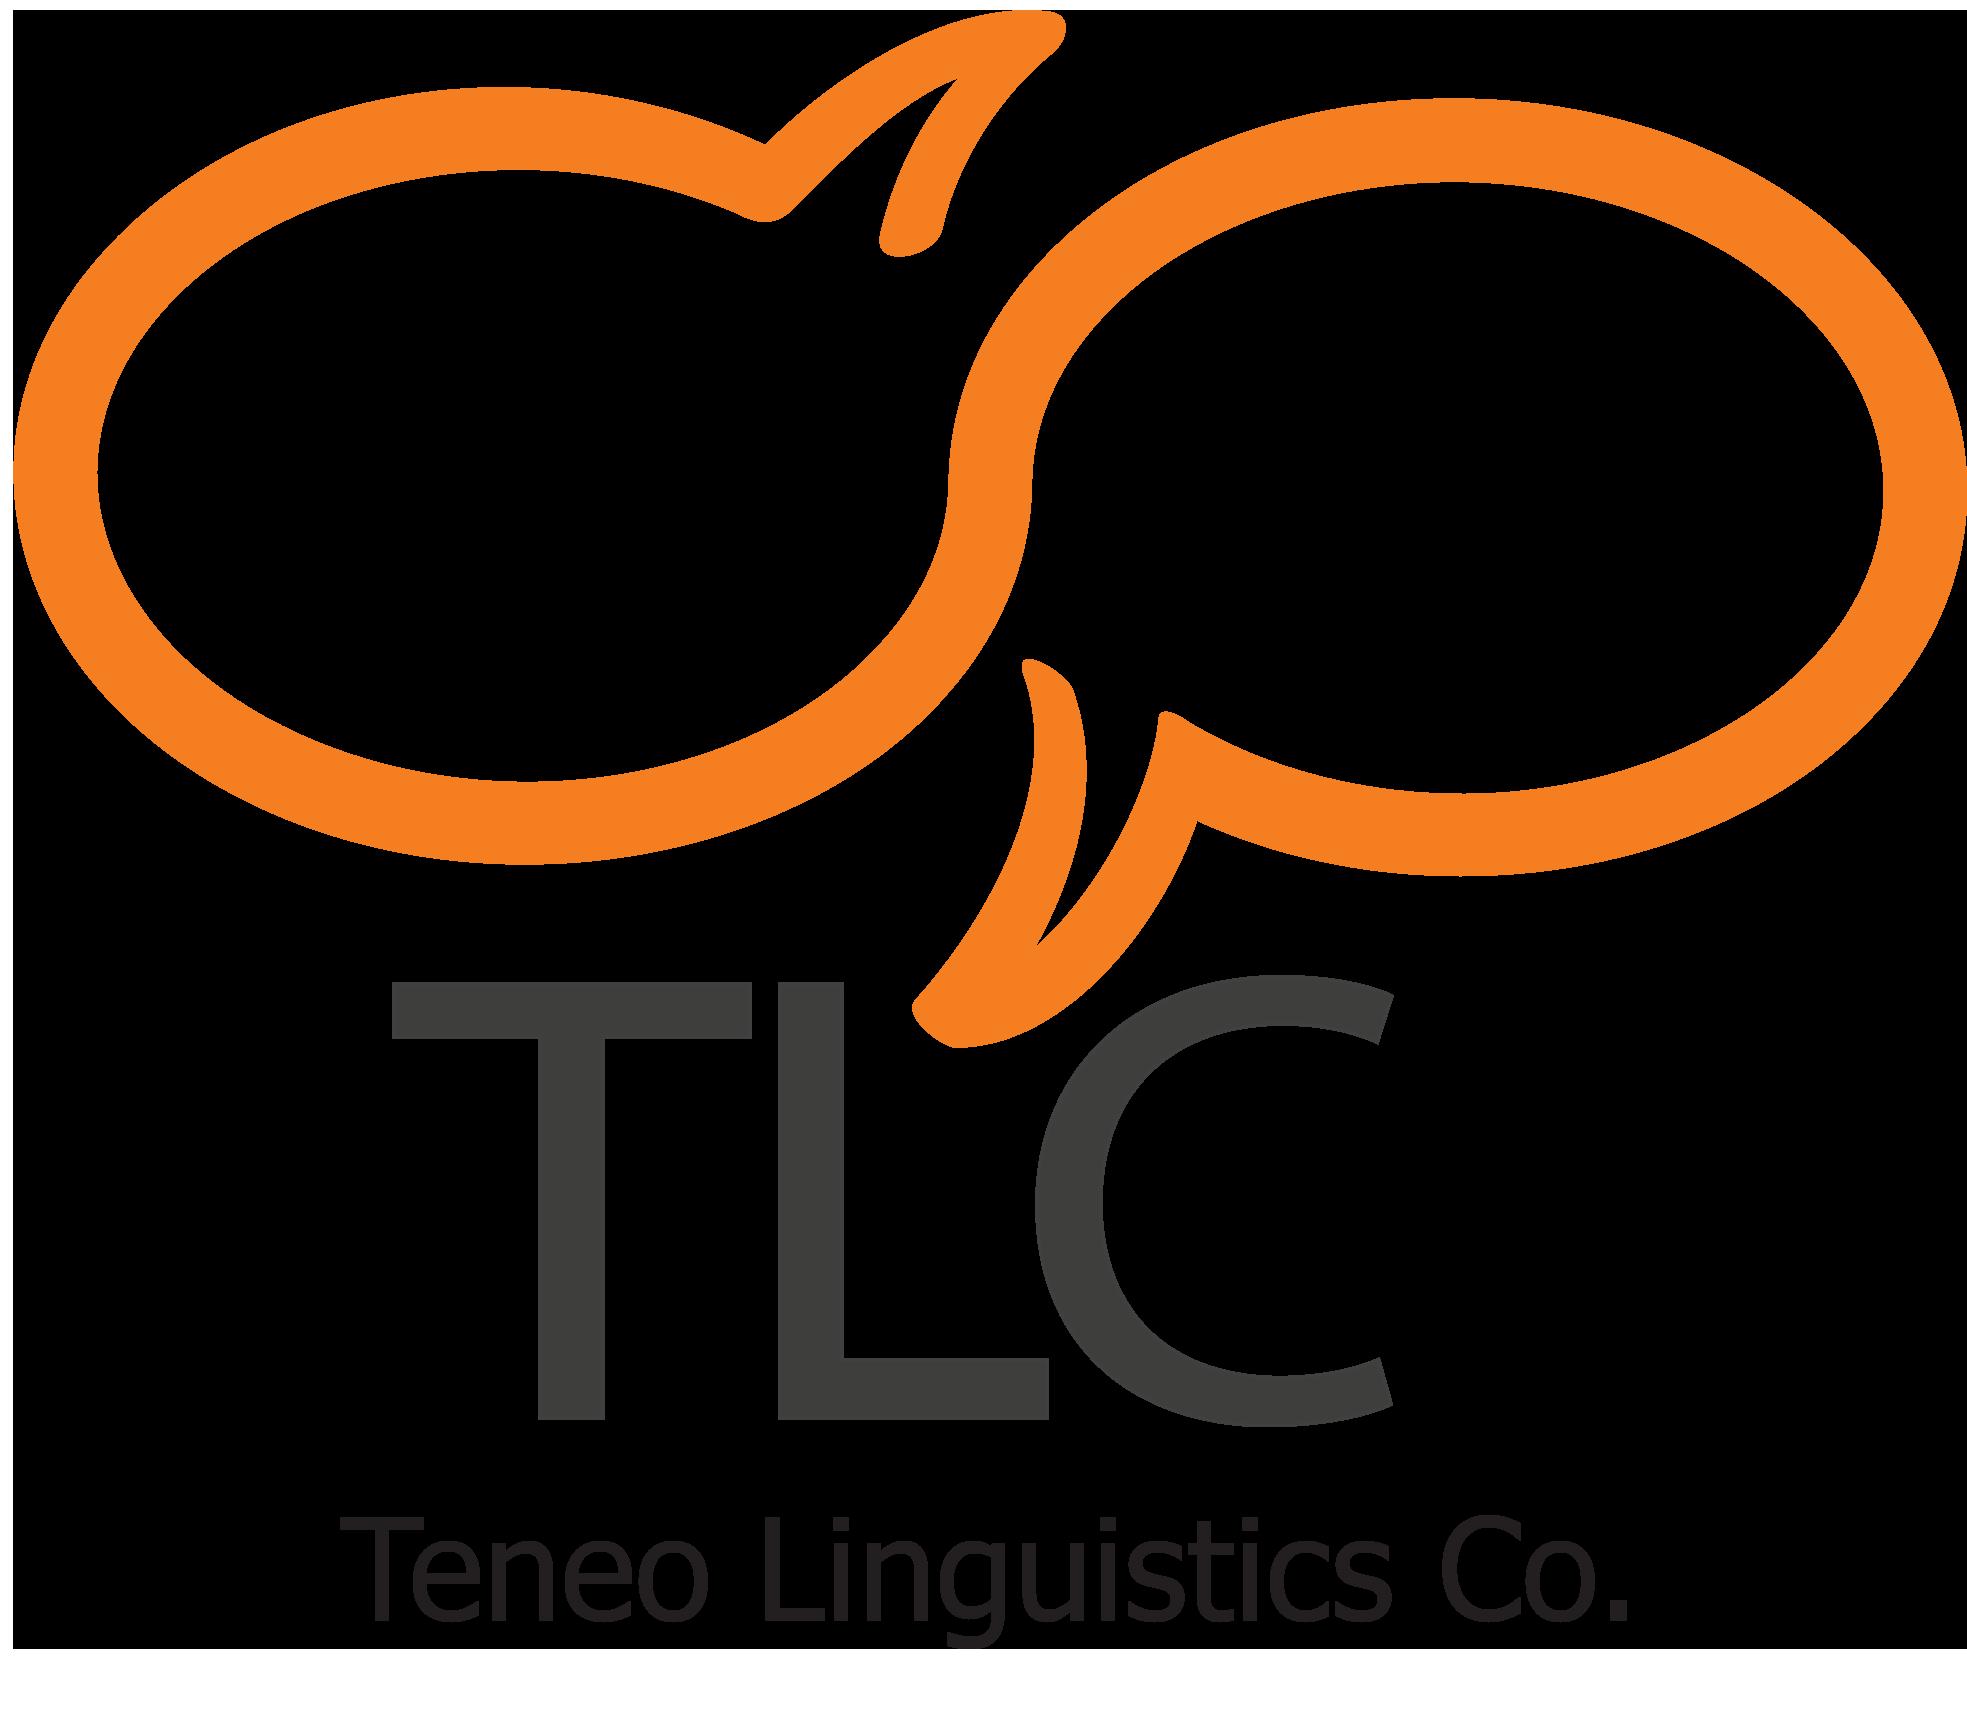 Teneo Linguistics Company Logo